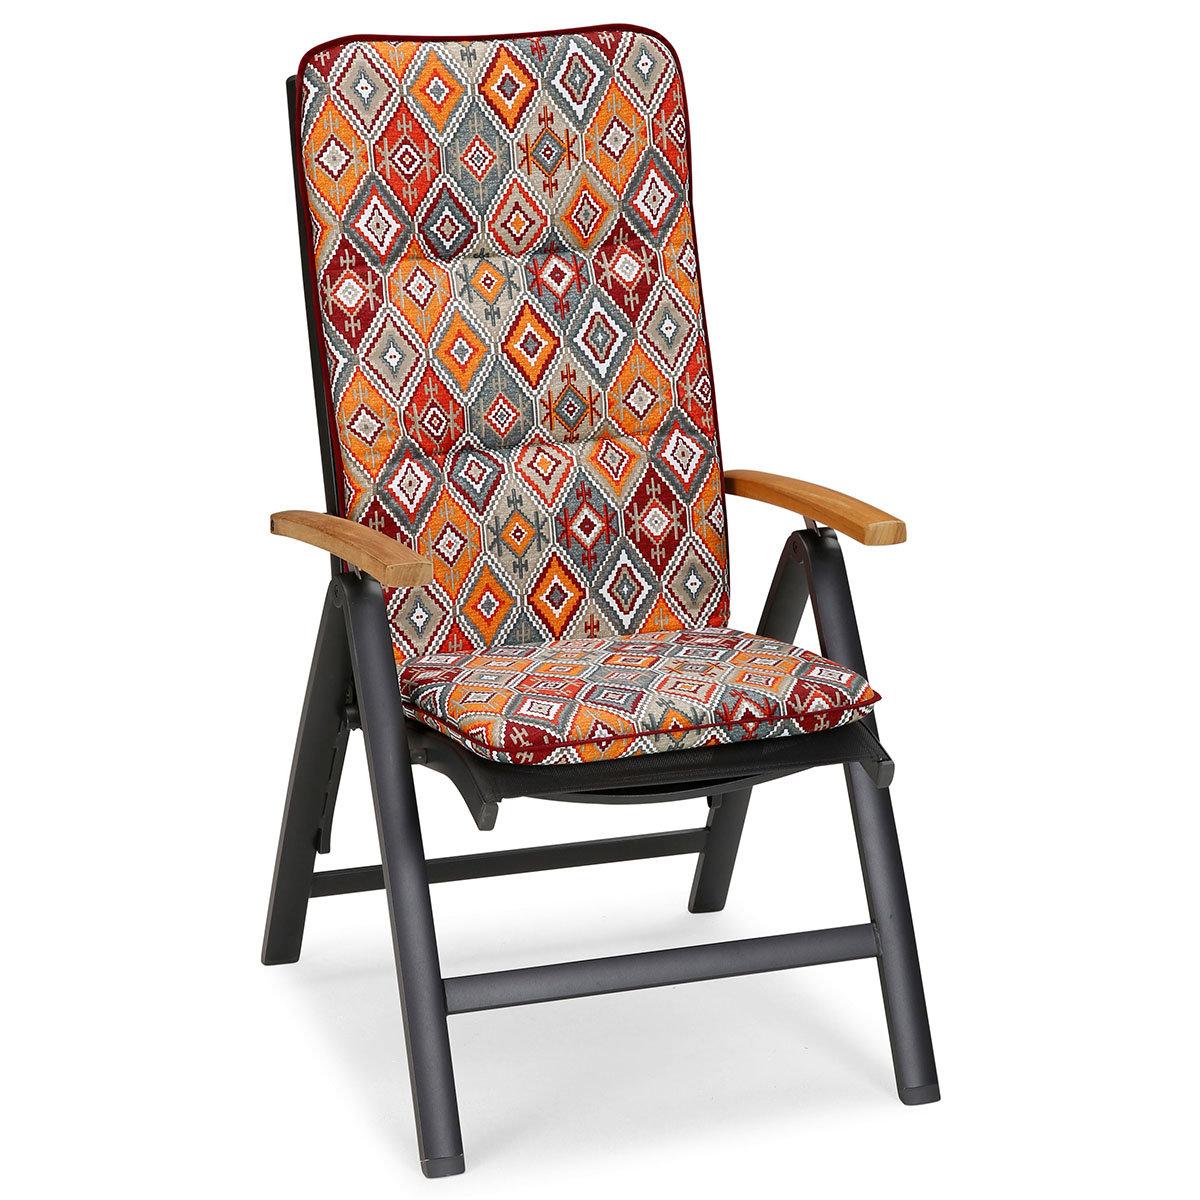 Hochlehner Auflage Porto, Rautendesign, 120x50x6 cm, orange rot